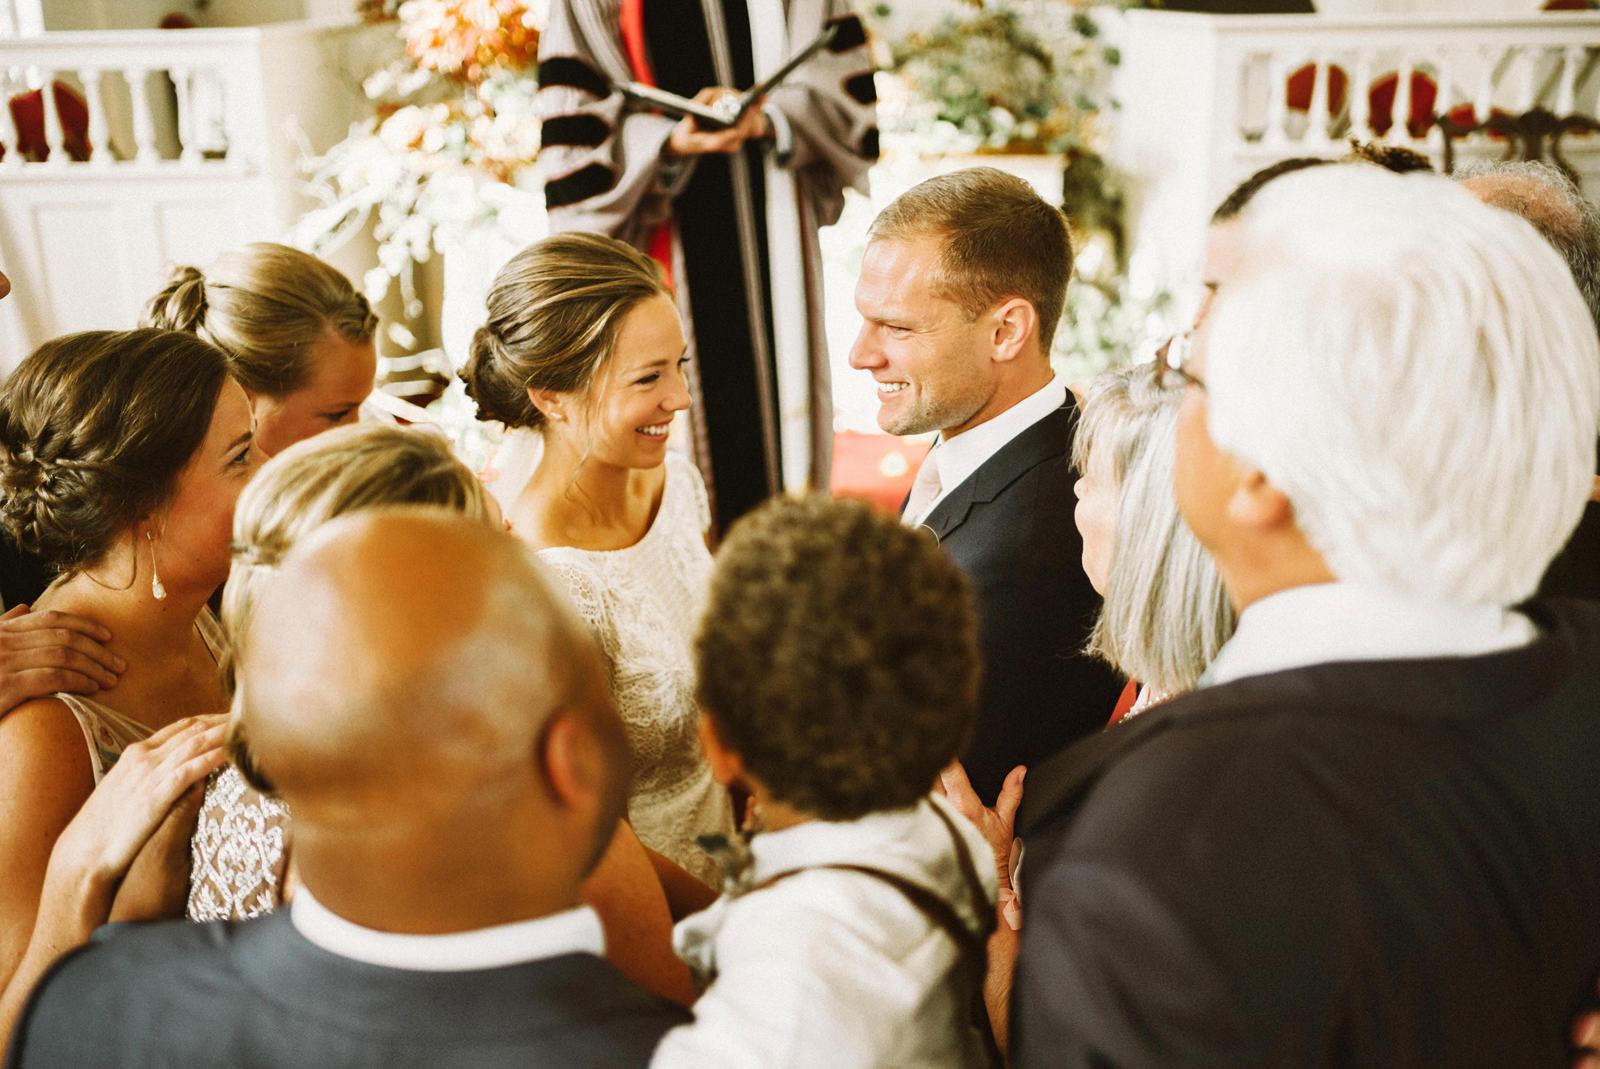 bridgeport-wedding-057 BRIDGEPORT, CONNECTICUT BACKYARD WEDDING